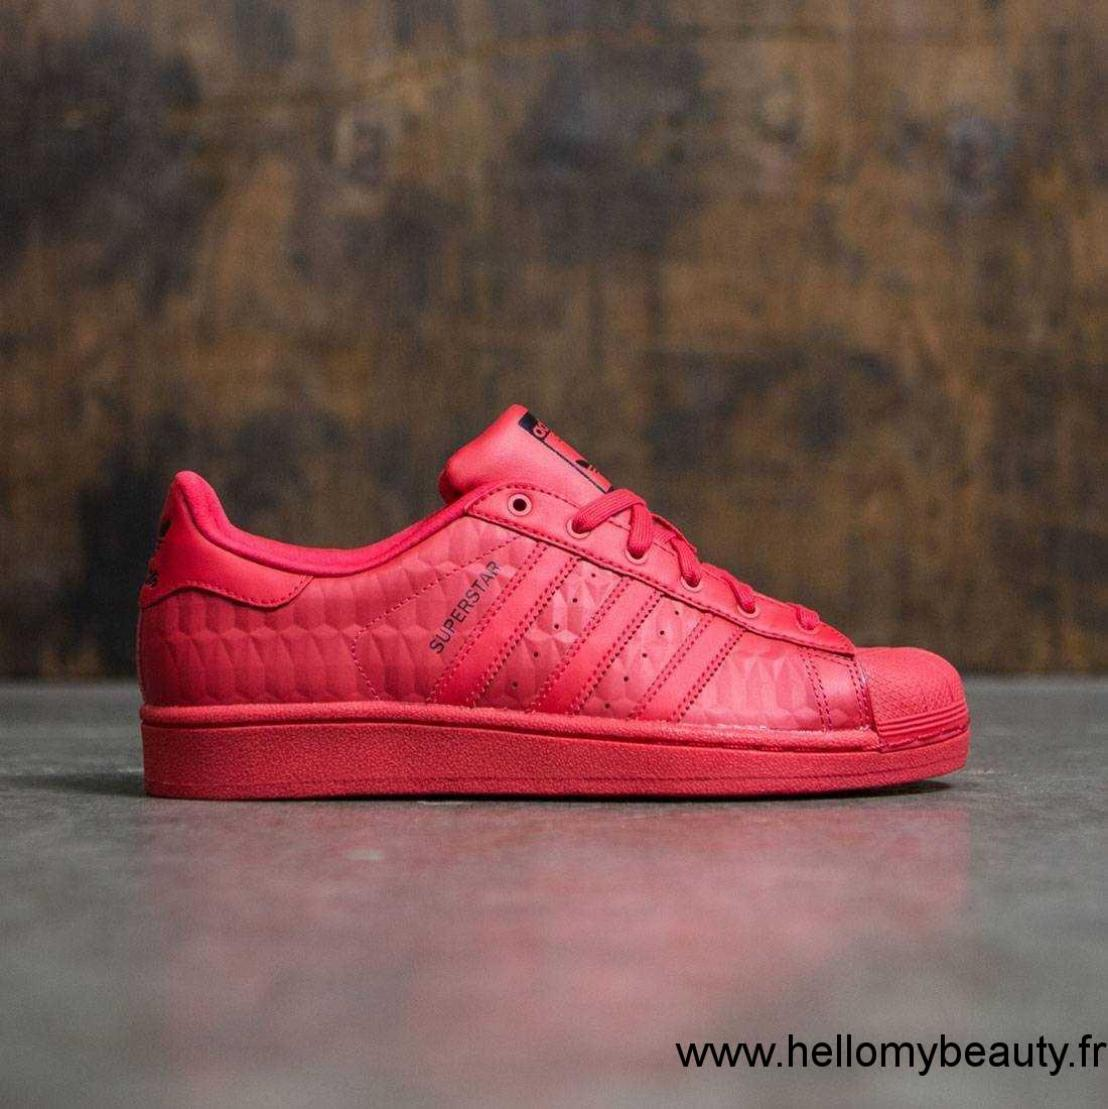 100% Authentique adidas superstar rouge taille 35 Outlet en